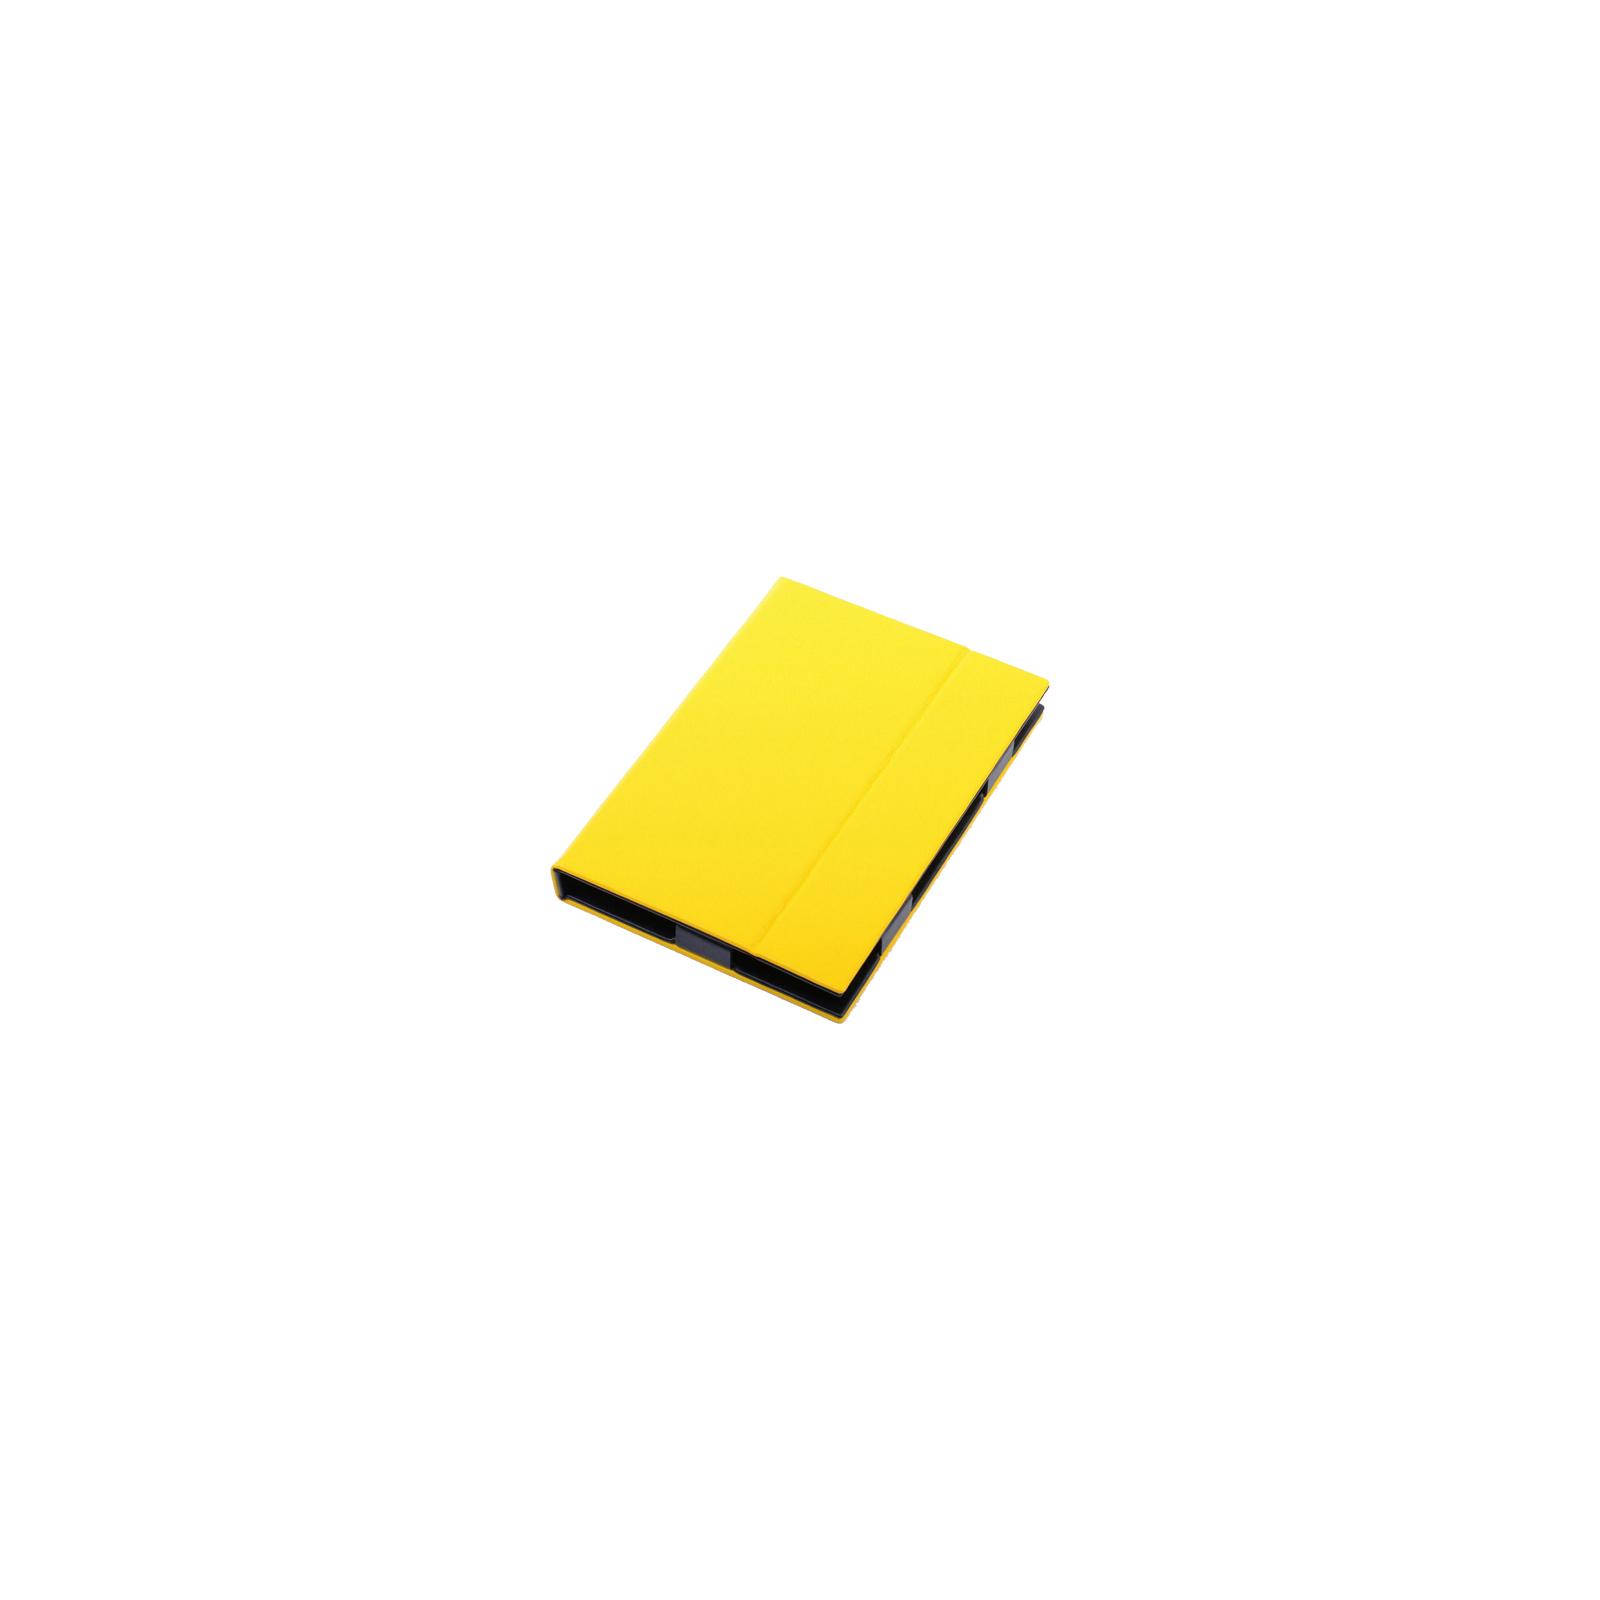 Чехол для планшета Vento 8 Desire Bright -yellow